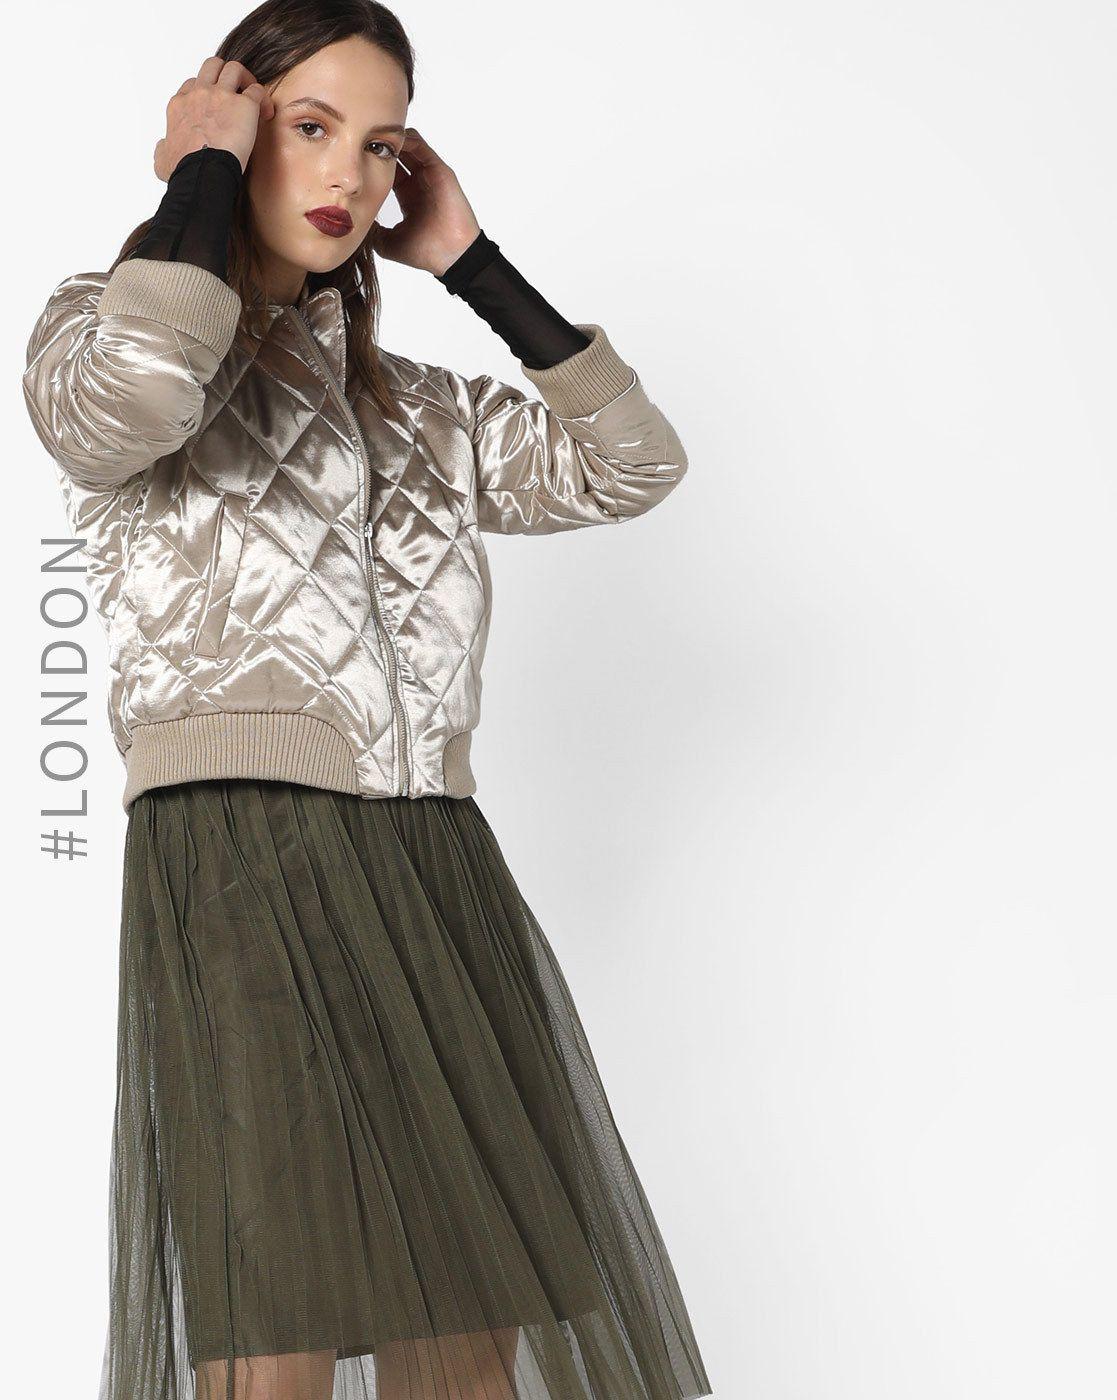 5a6418698 Buy Glamorous Women Gold Front-Zip Quilted Biker Jacket   AJIO ...